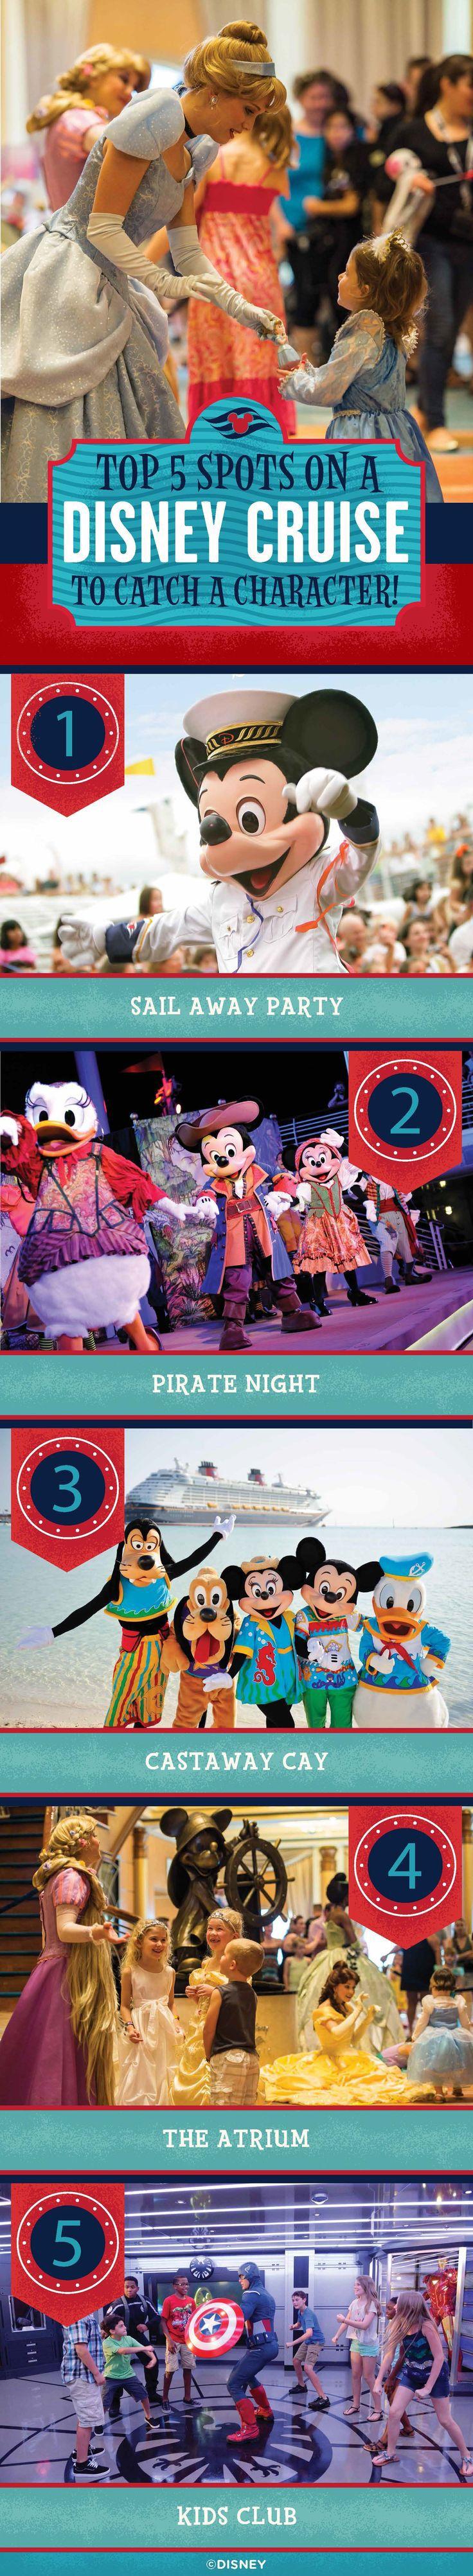 Best Disney Cruise Line Images On Pinterest Cruises Cruise - Disney cruise ship toy